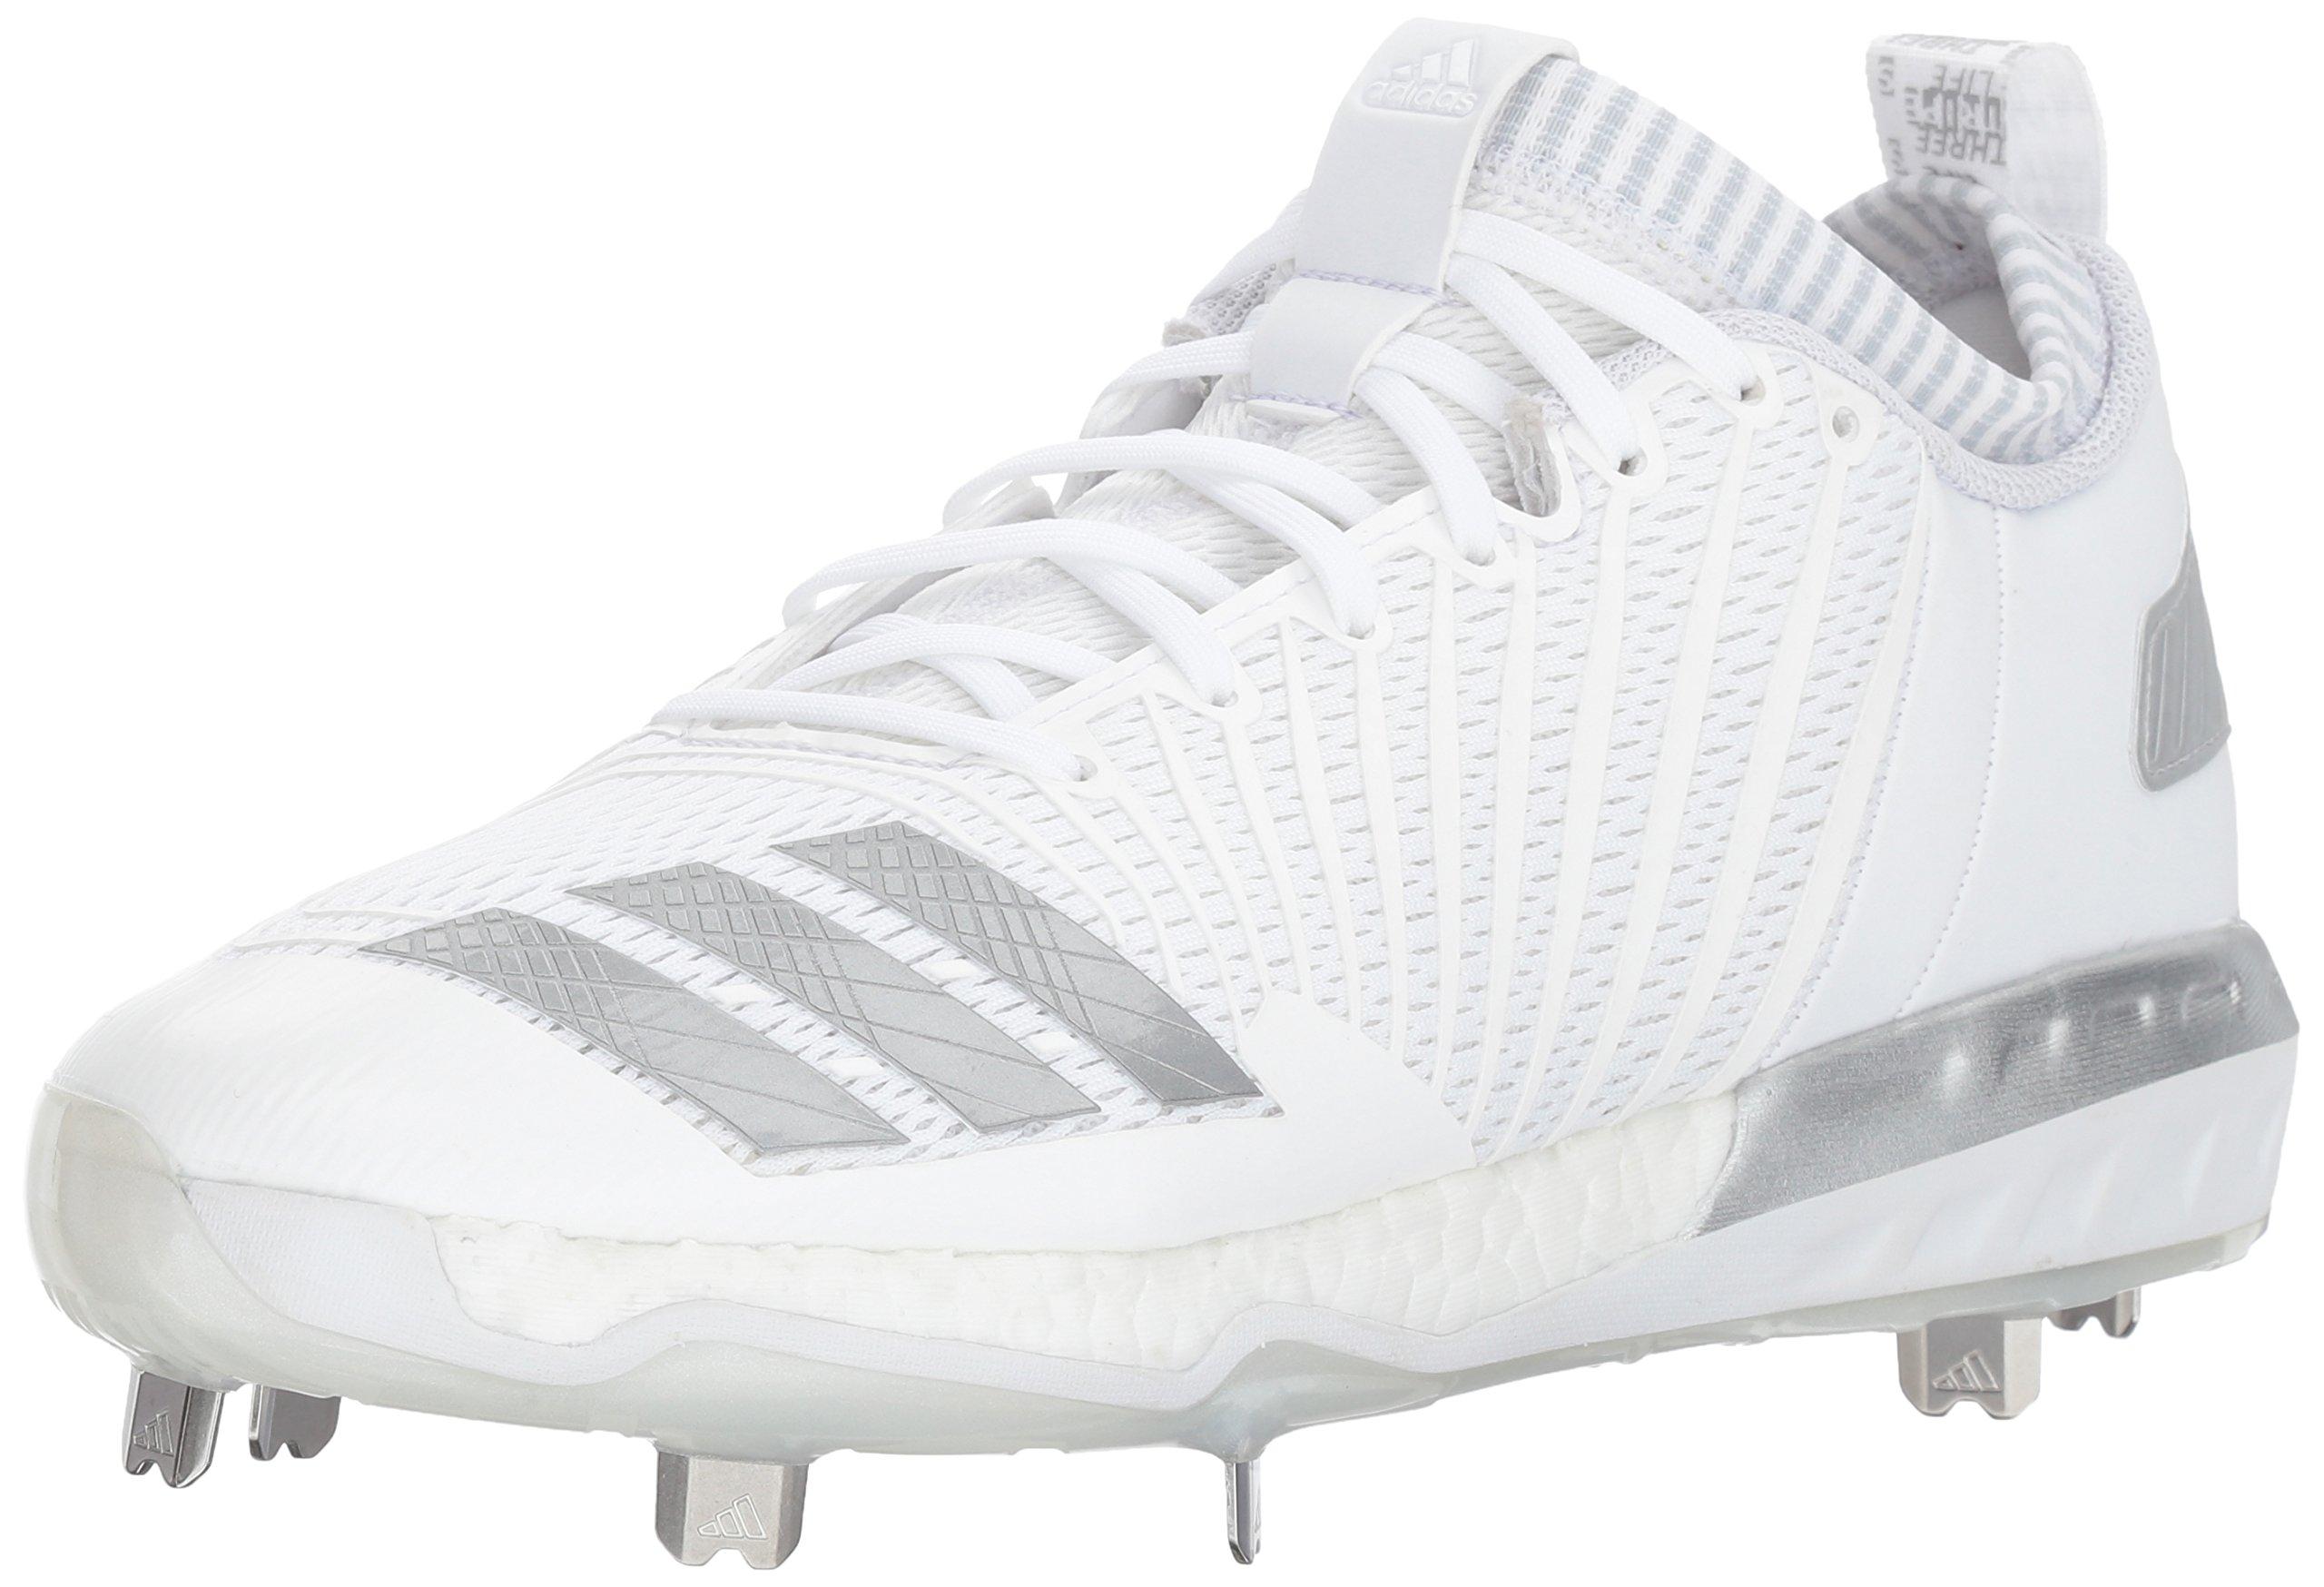 info for a9e0b 6a7ee Galleon - Adidas Men s Freak X Carbon Mid Baseball Shoe White Metallic  Silver Light Grey 12 Medium US